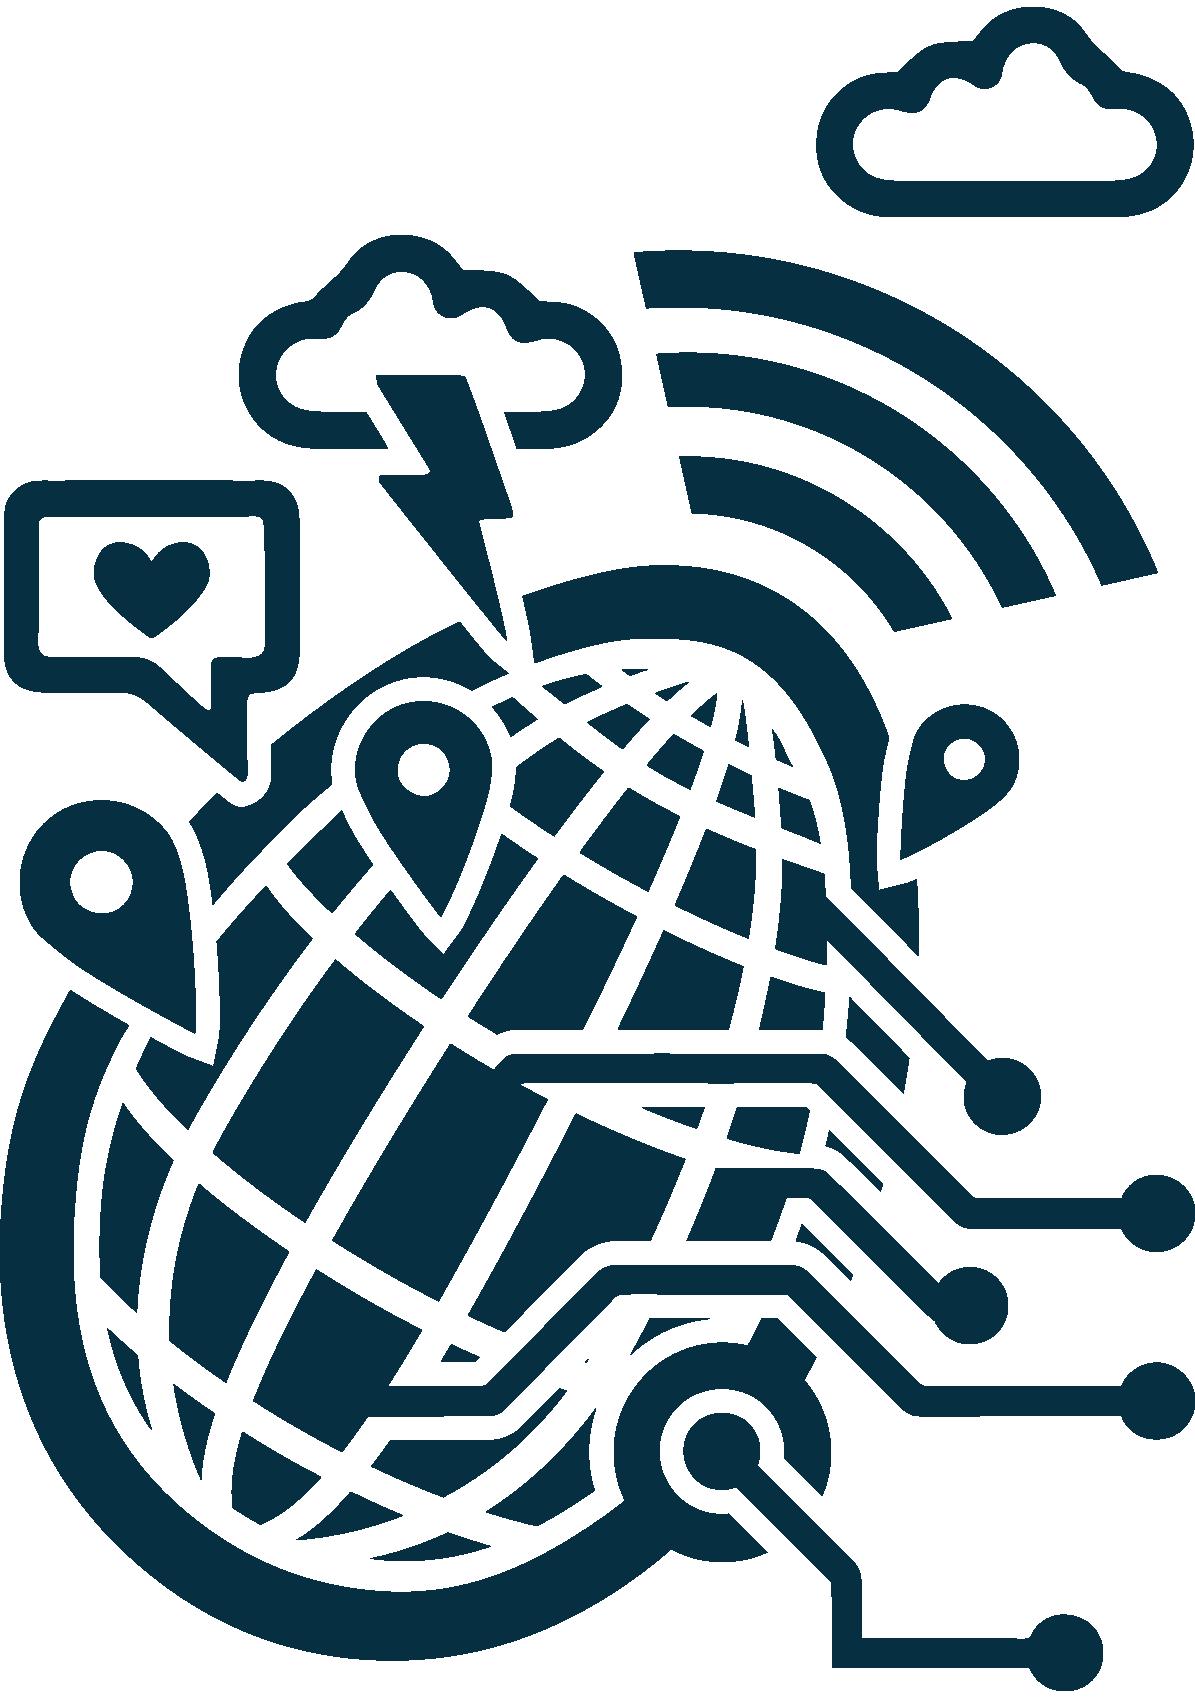 Biz-Site-TechnologyIntegration(DK)